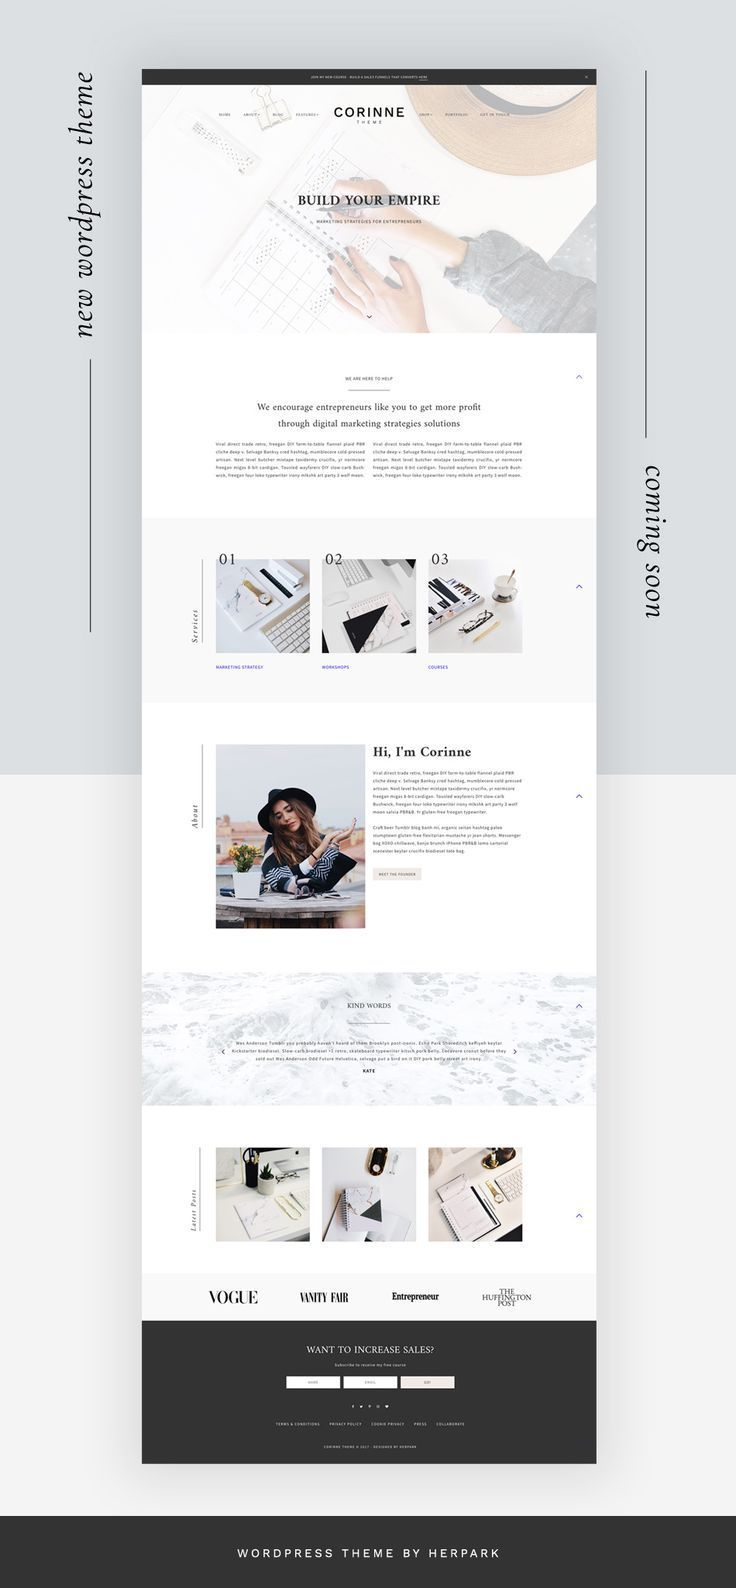 Portfolio Corinne Genesis Child Theme eCommerce Feminine Wordpress Theme for Female Entrepreneurs